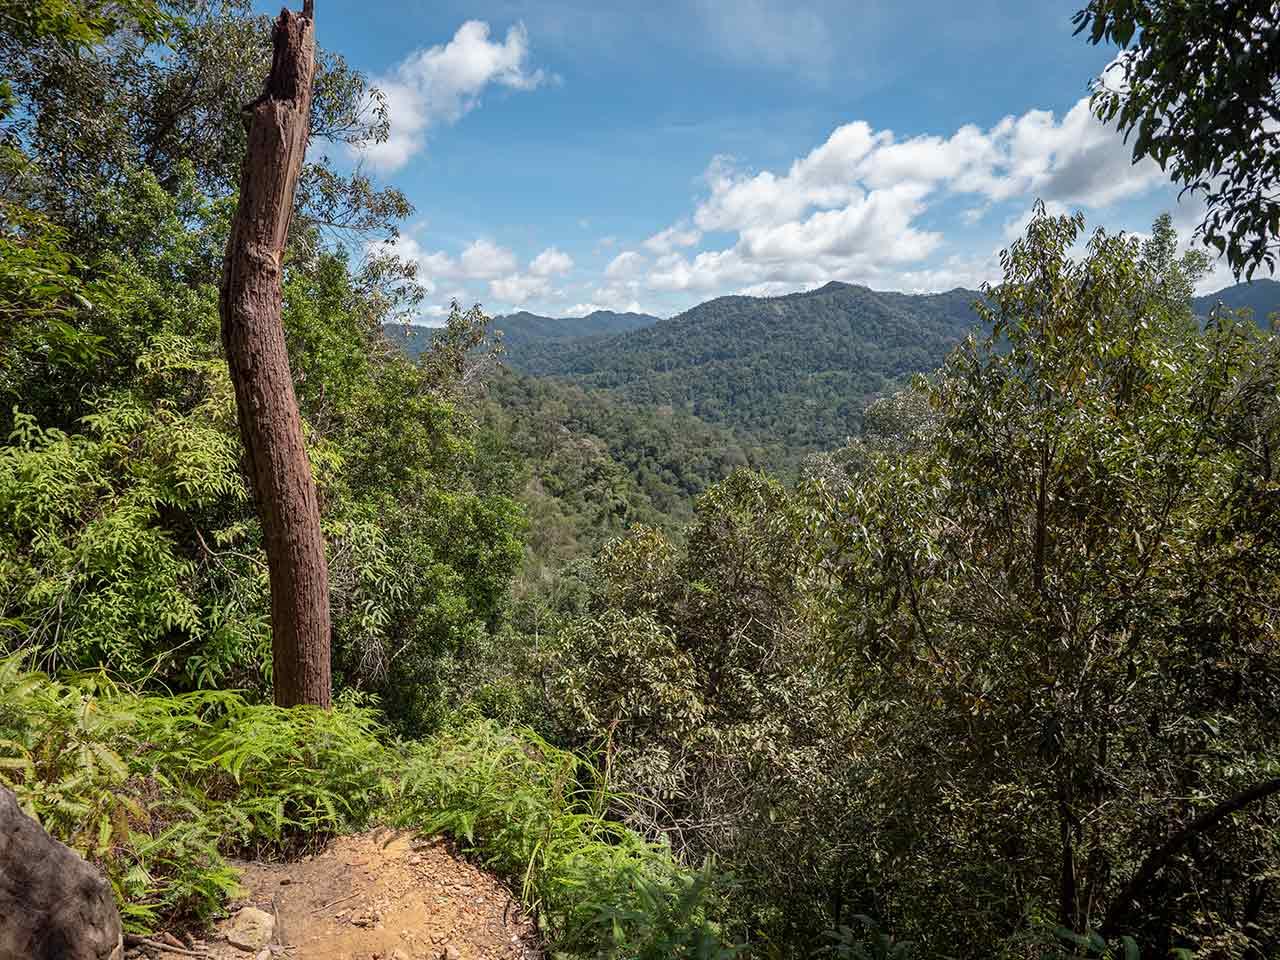 Aussichtspunkt Burit Teresek im Taman Negara Nationalpark